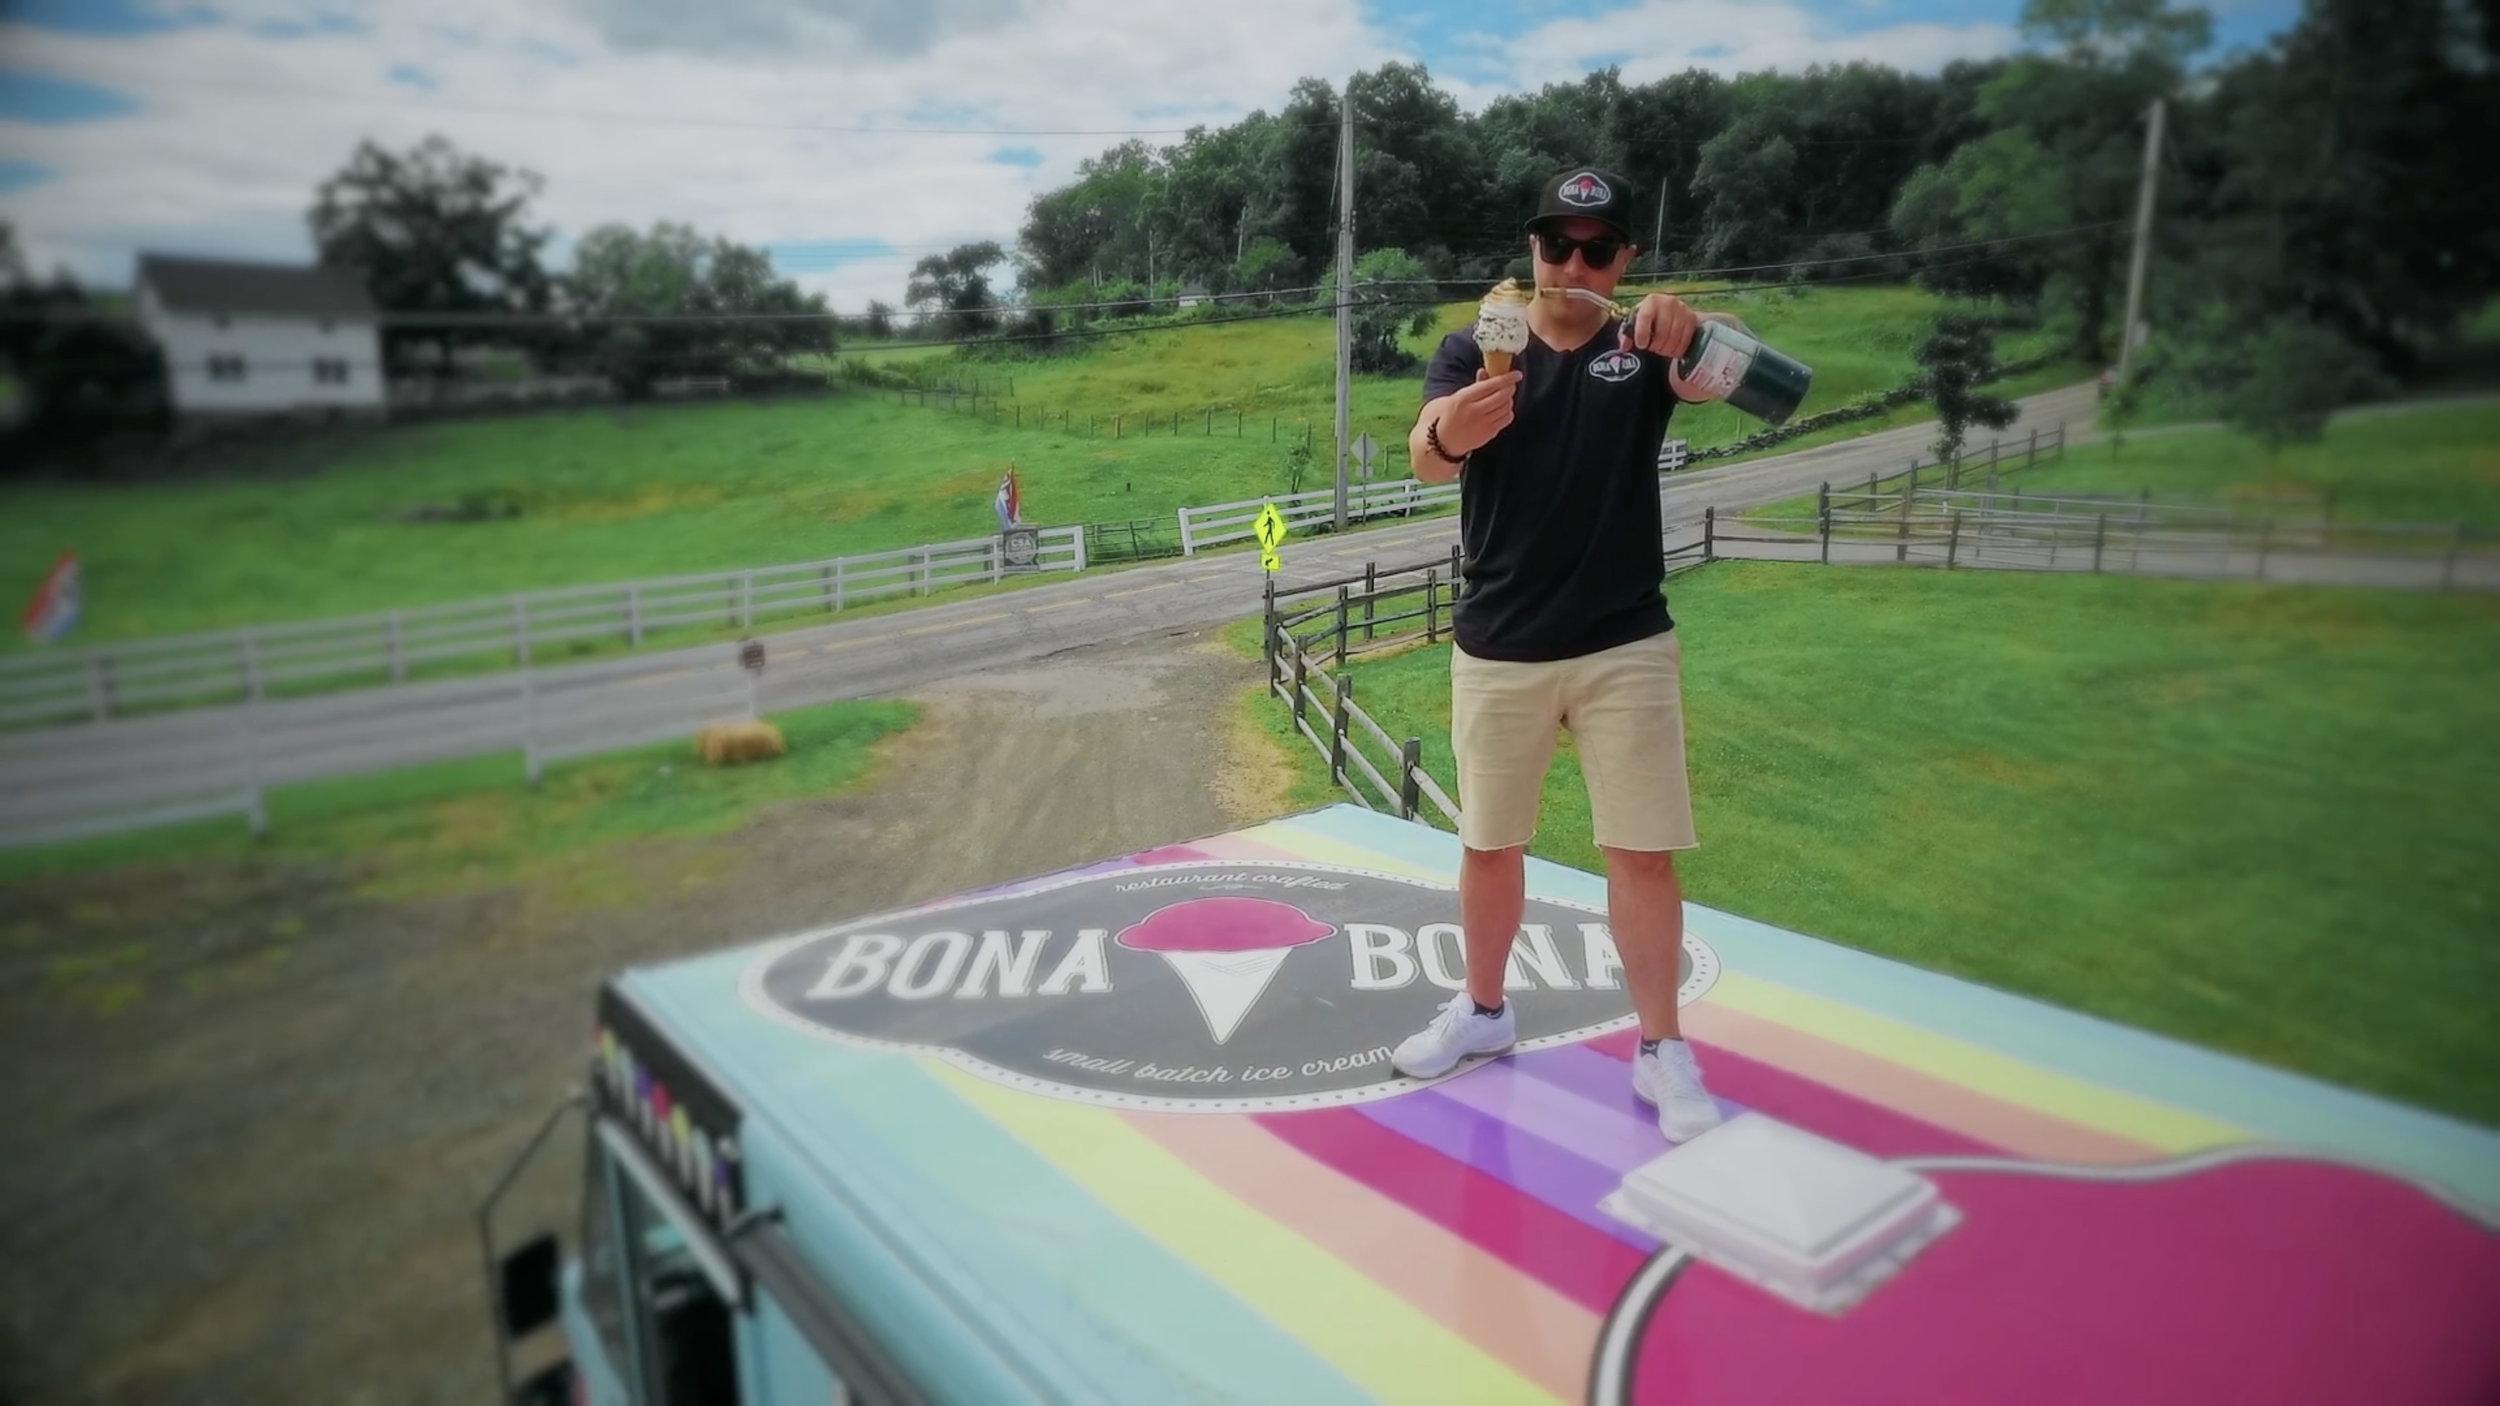 Bona Bona Ice Cream  Food Truck Friday